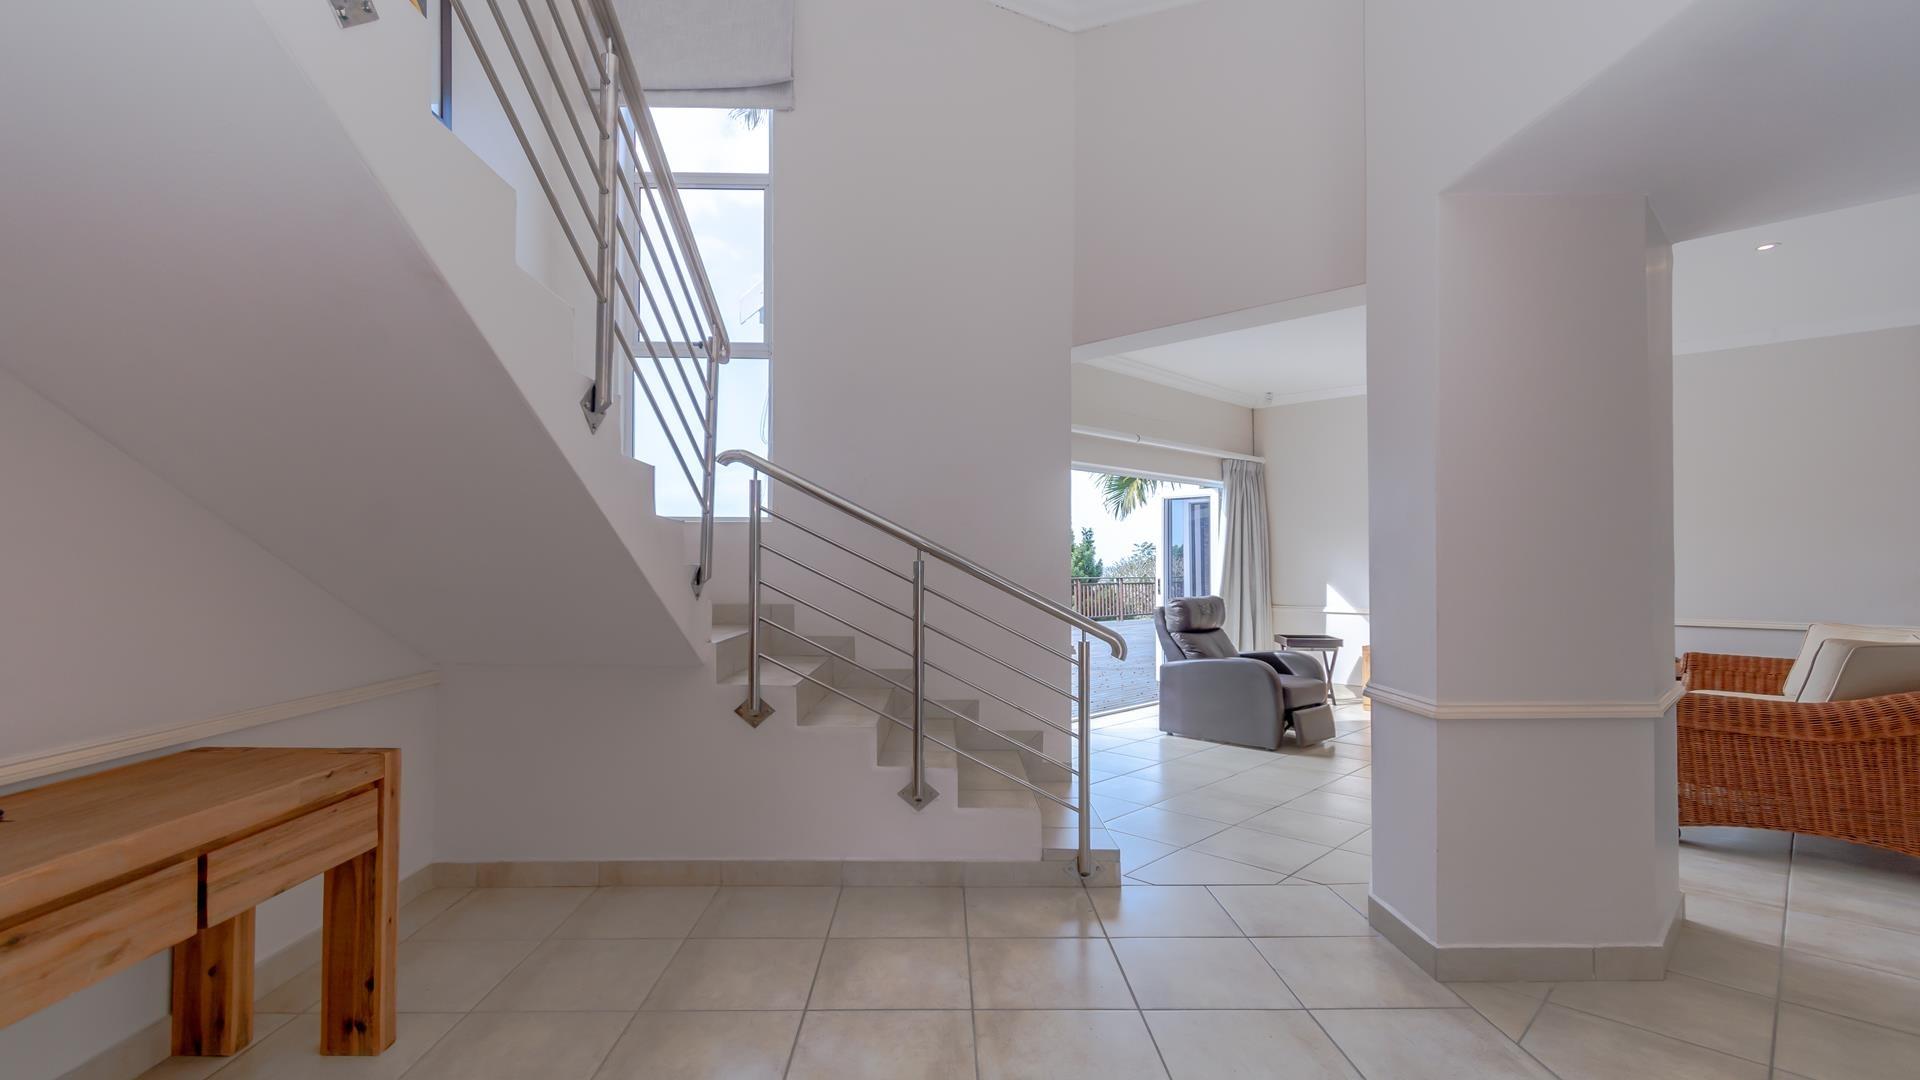 6 Bedroom House For Sale in Zinkwazi Beach